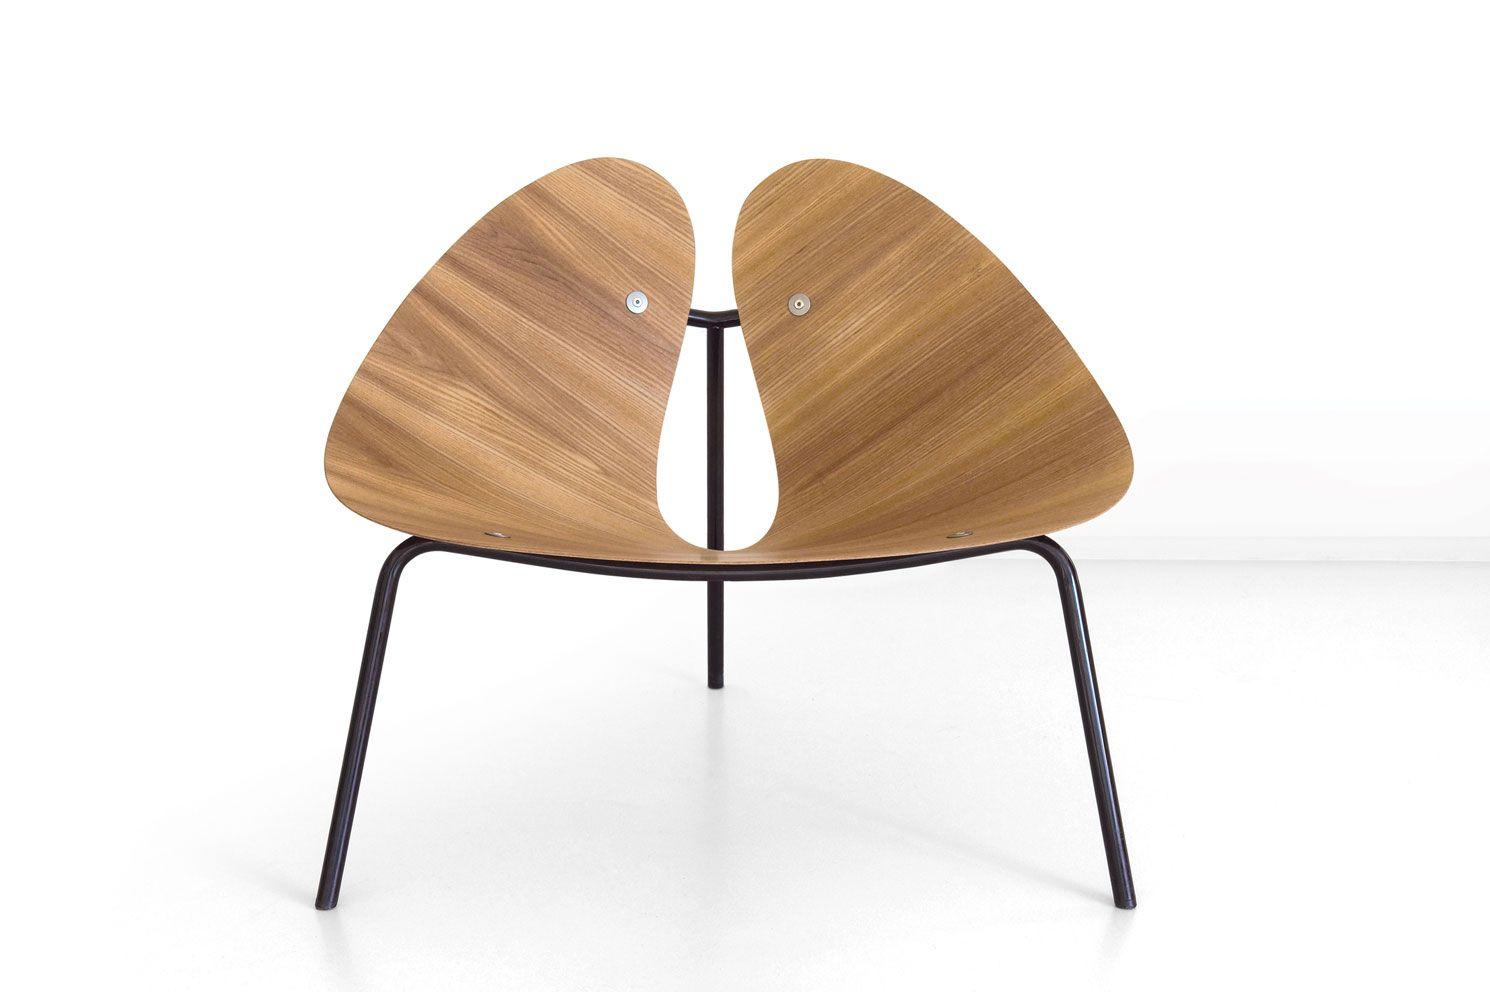 Poltrona Ginko (Gam Fratesi) - Danish Design